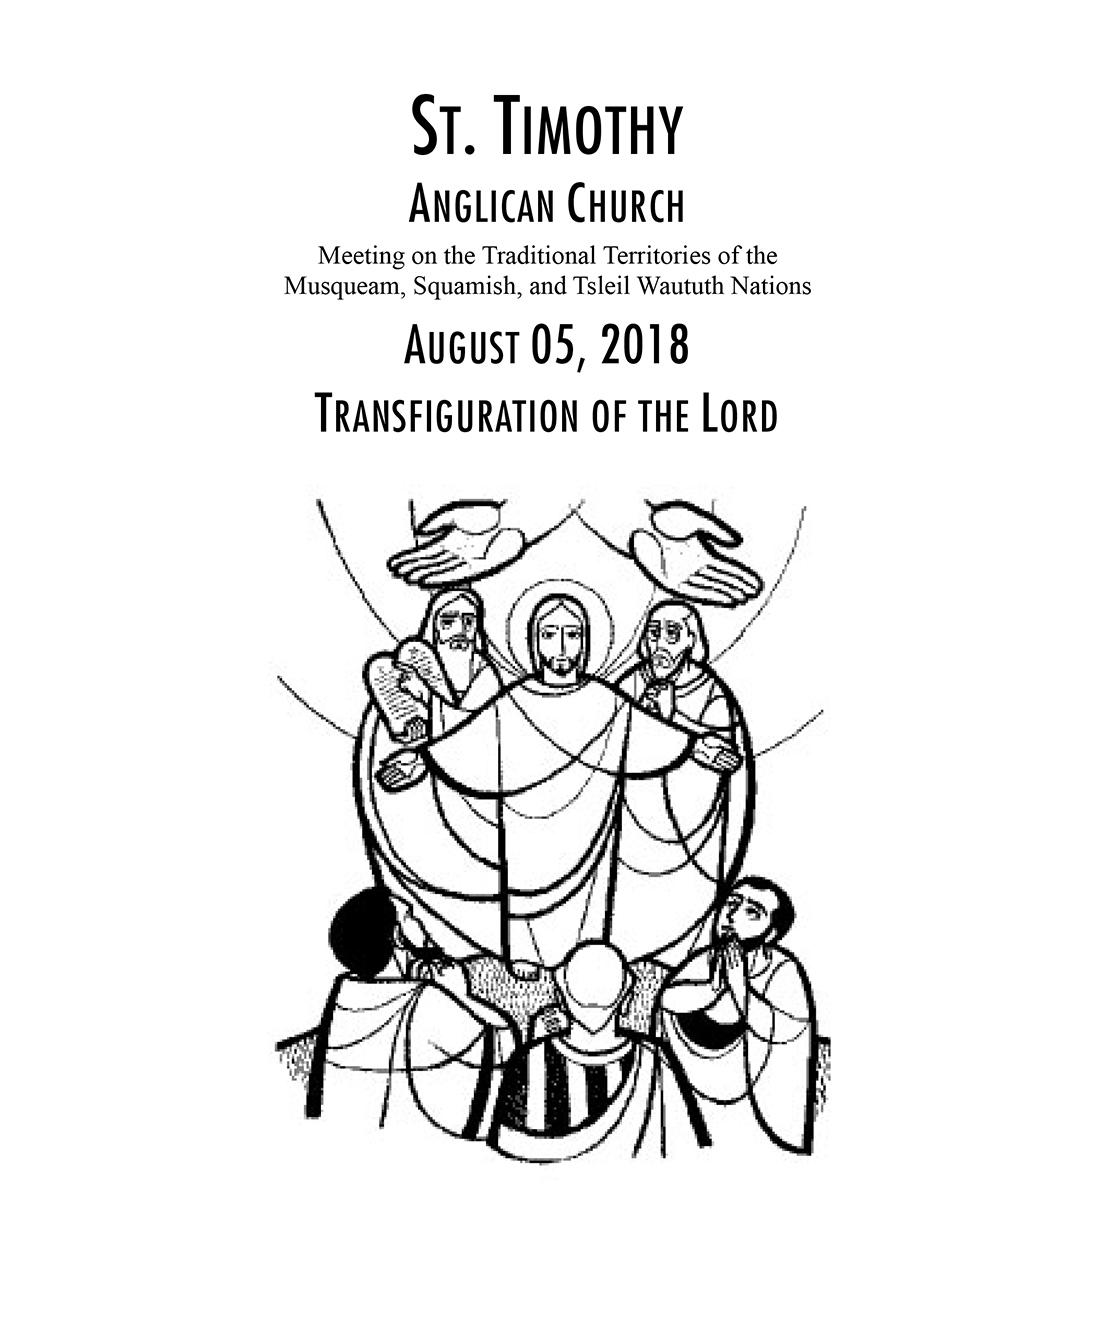 Bulletin: August 5, 2018